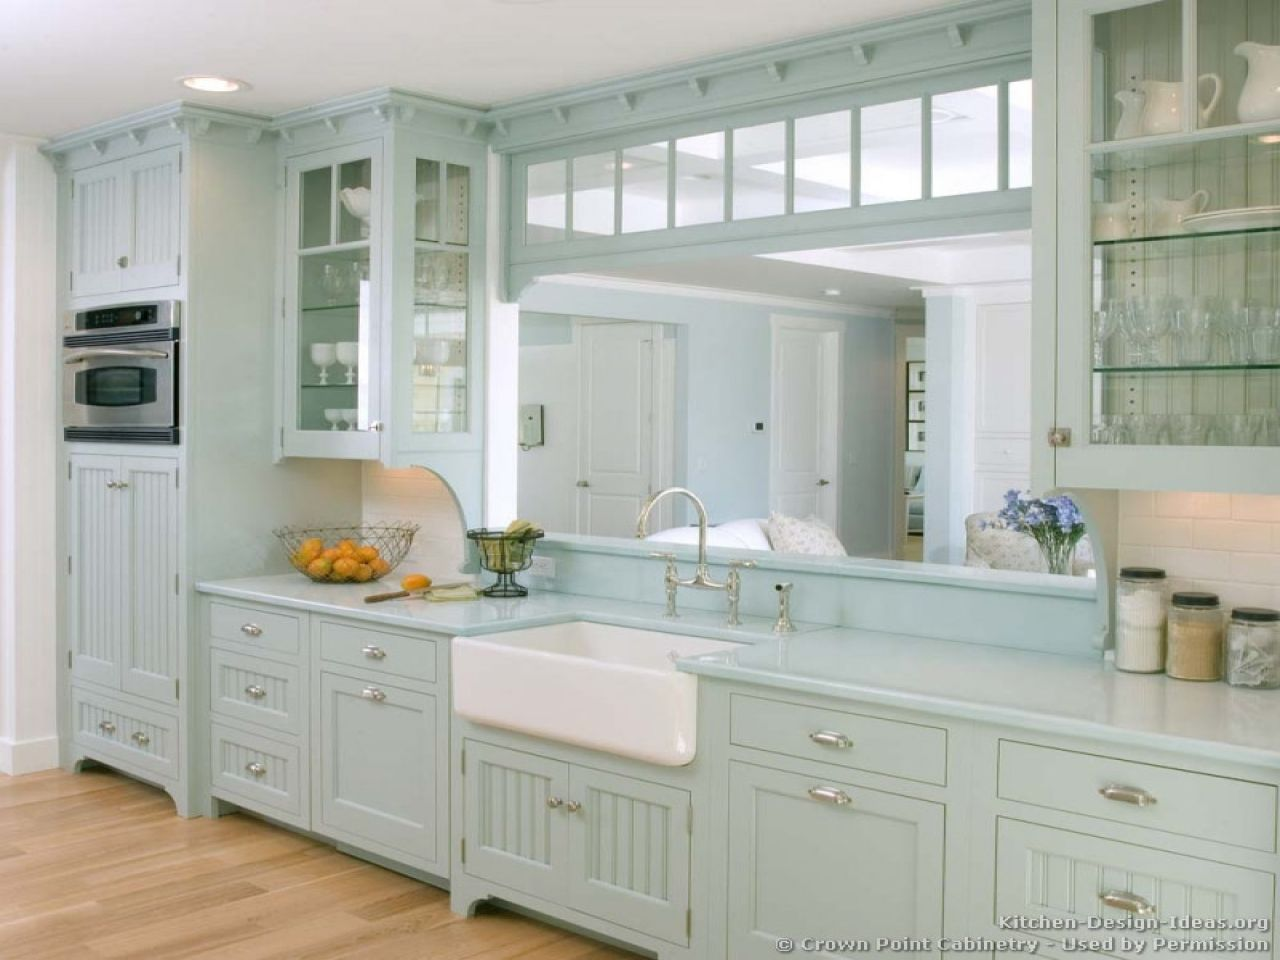 Kitchen With Pass Through Small Galley Kitchens Pass Through A802c25b11130bd5 Jpg 1280 960 Victorian Kitchen Cabinets Blue Kitchen Cabinets Blue Countertops